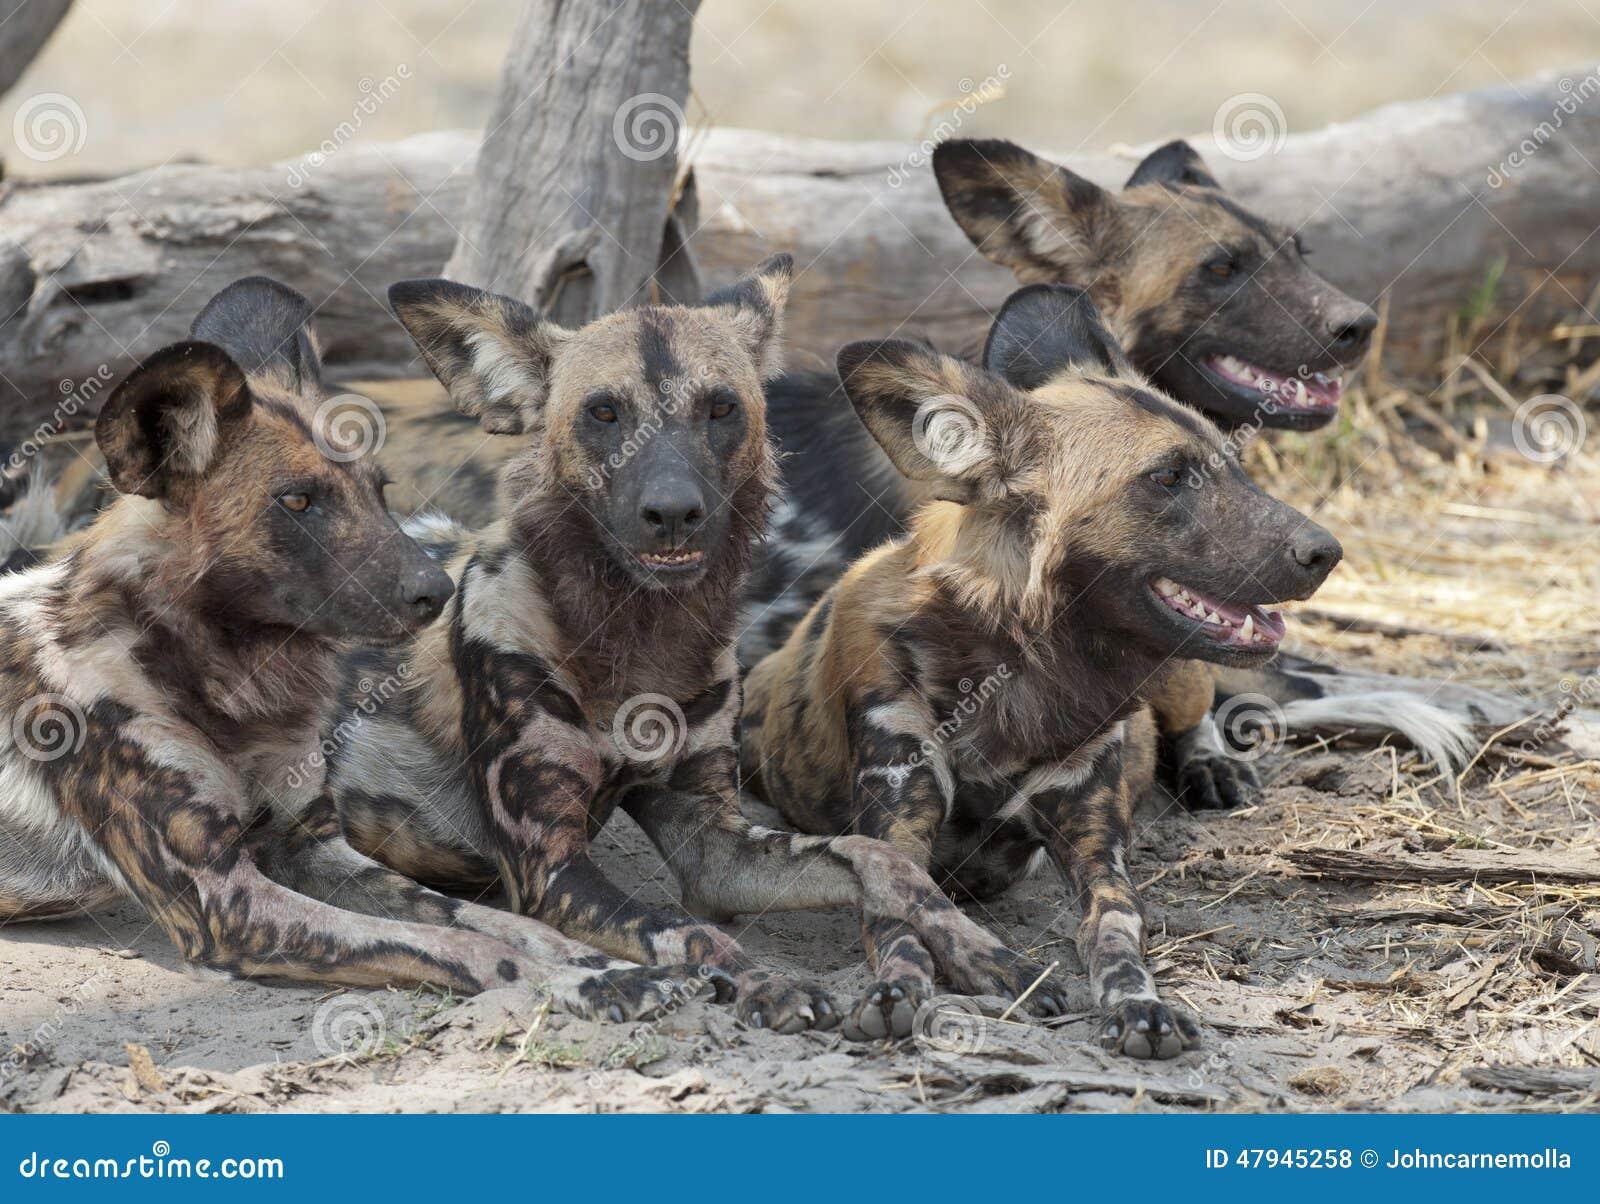 Dogs wild